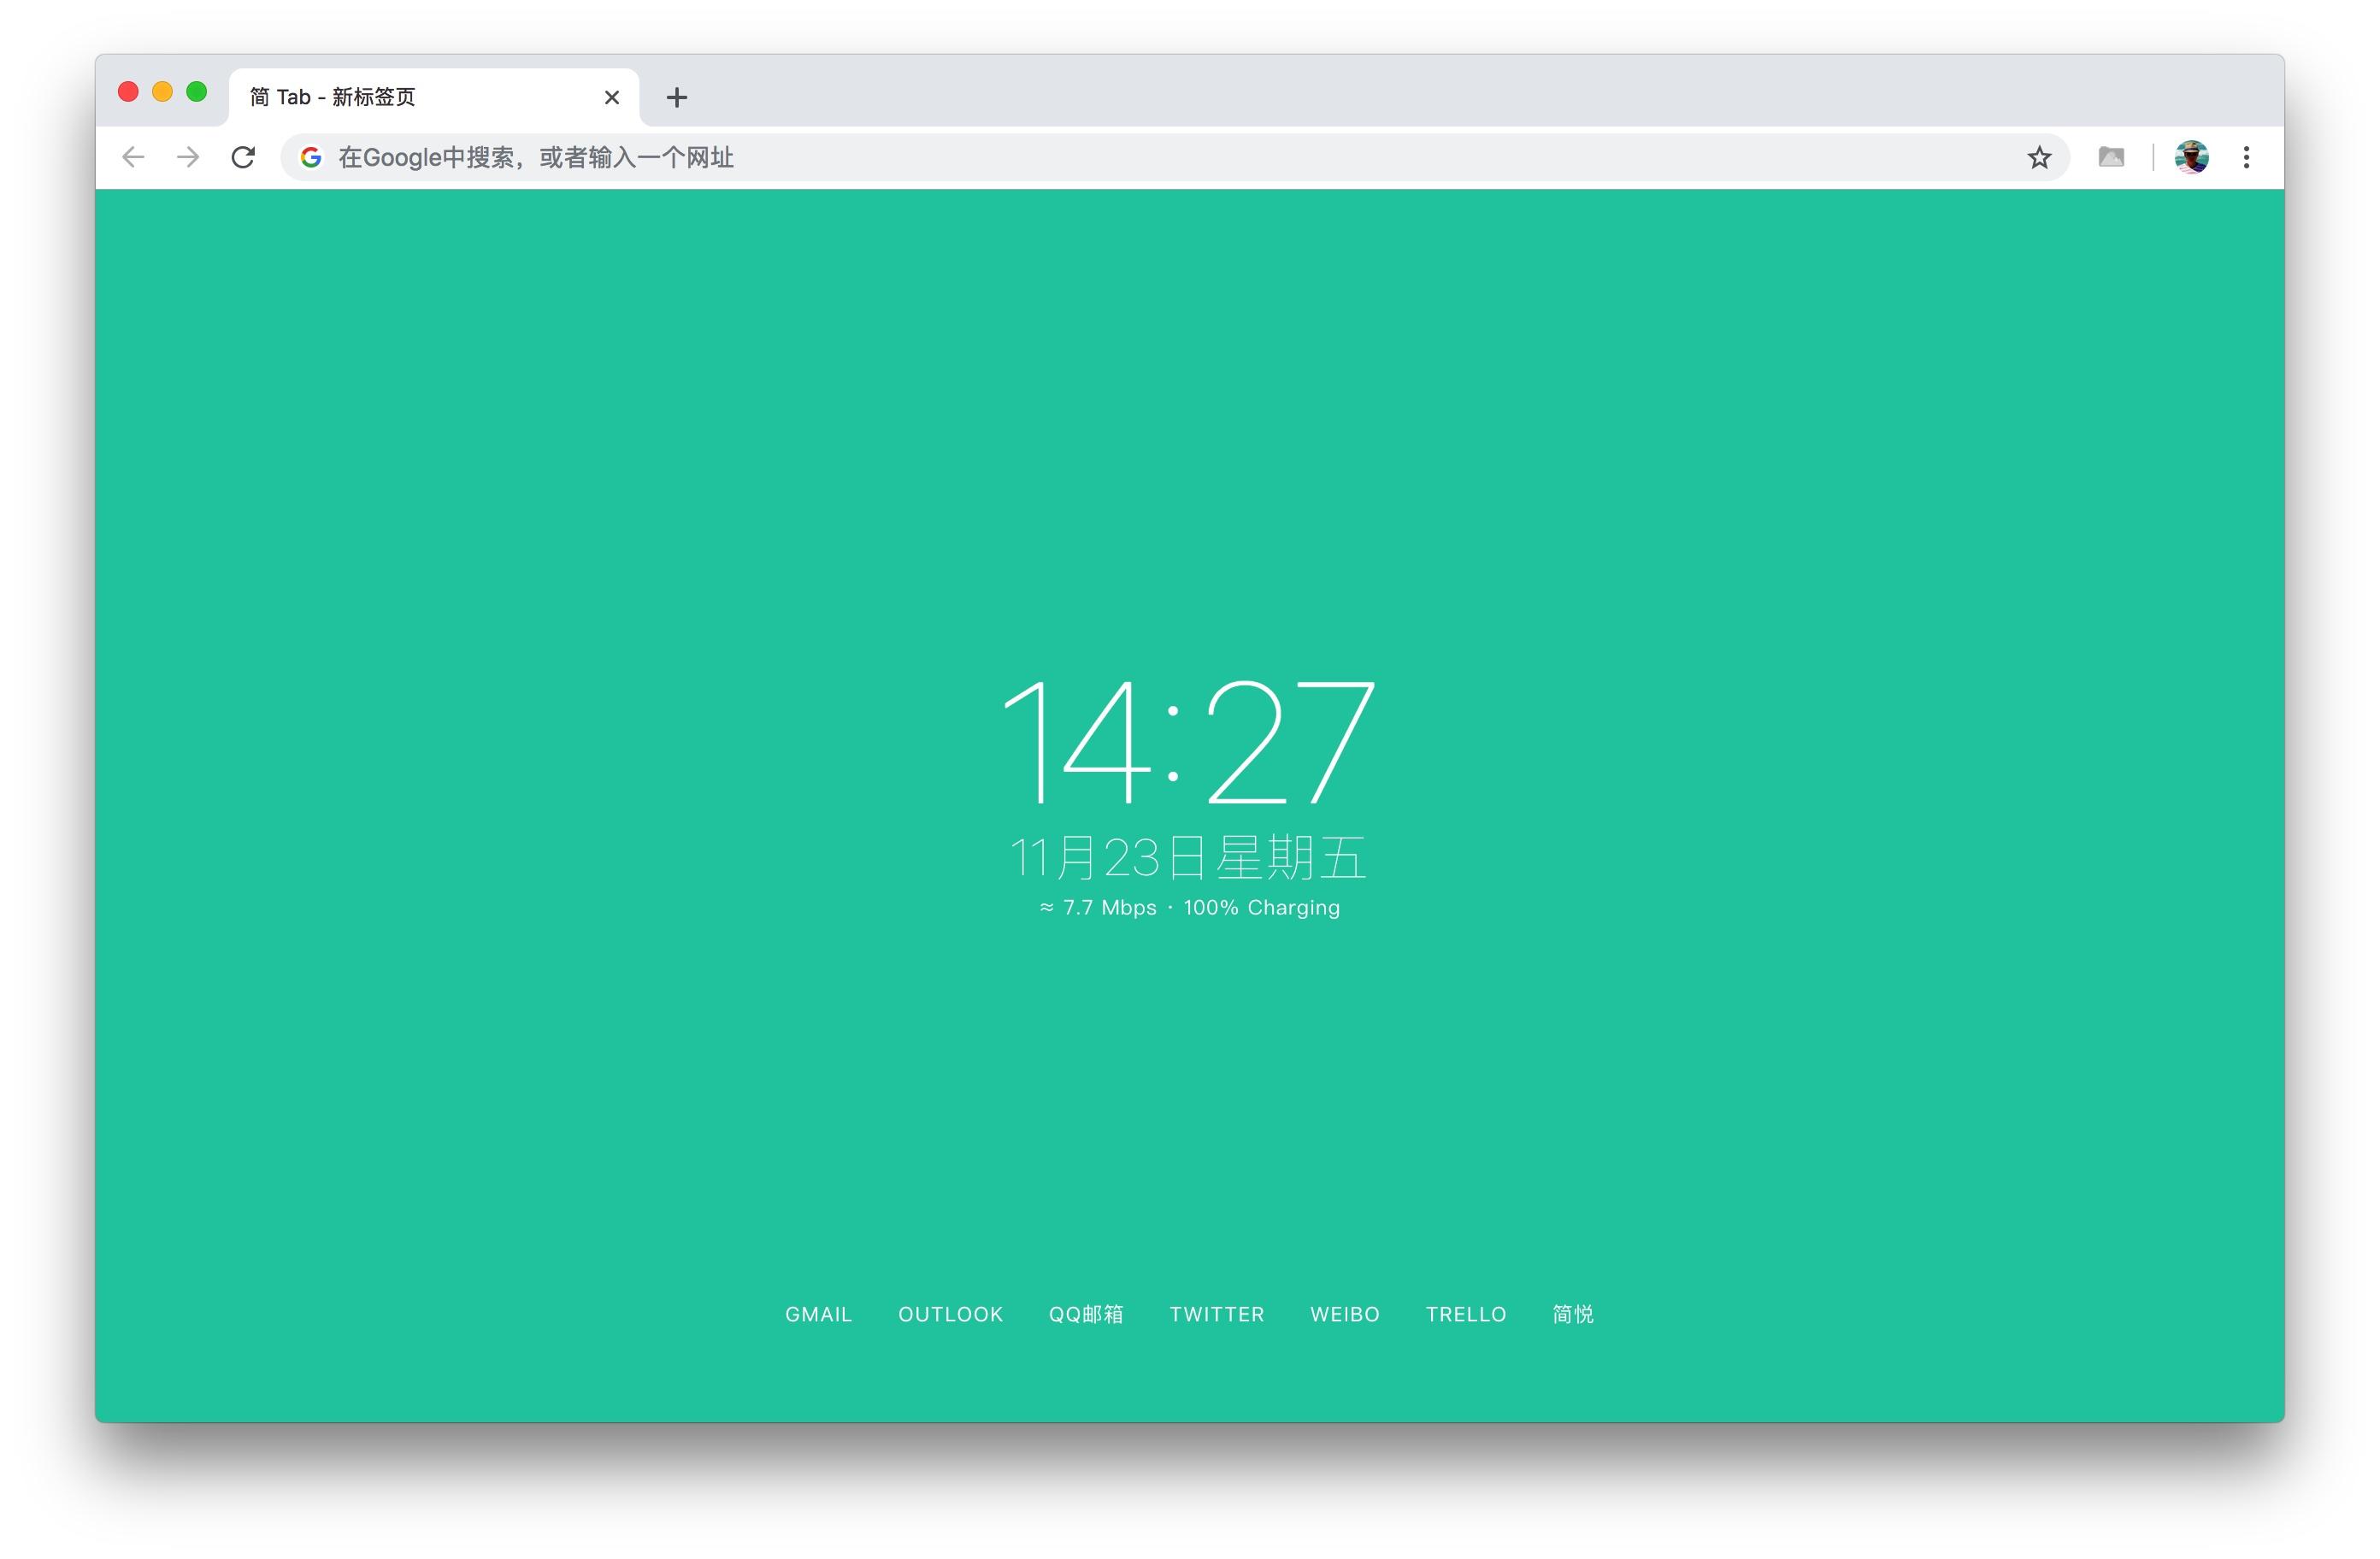 Xnip2018-11-23_14-27-55.jpg